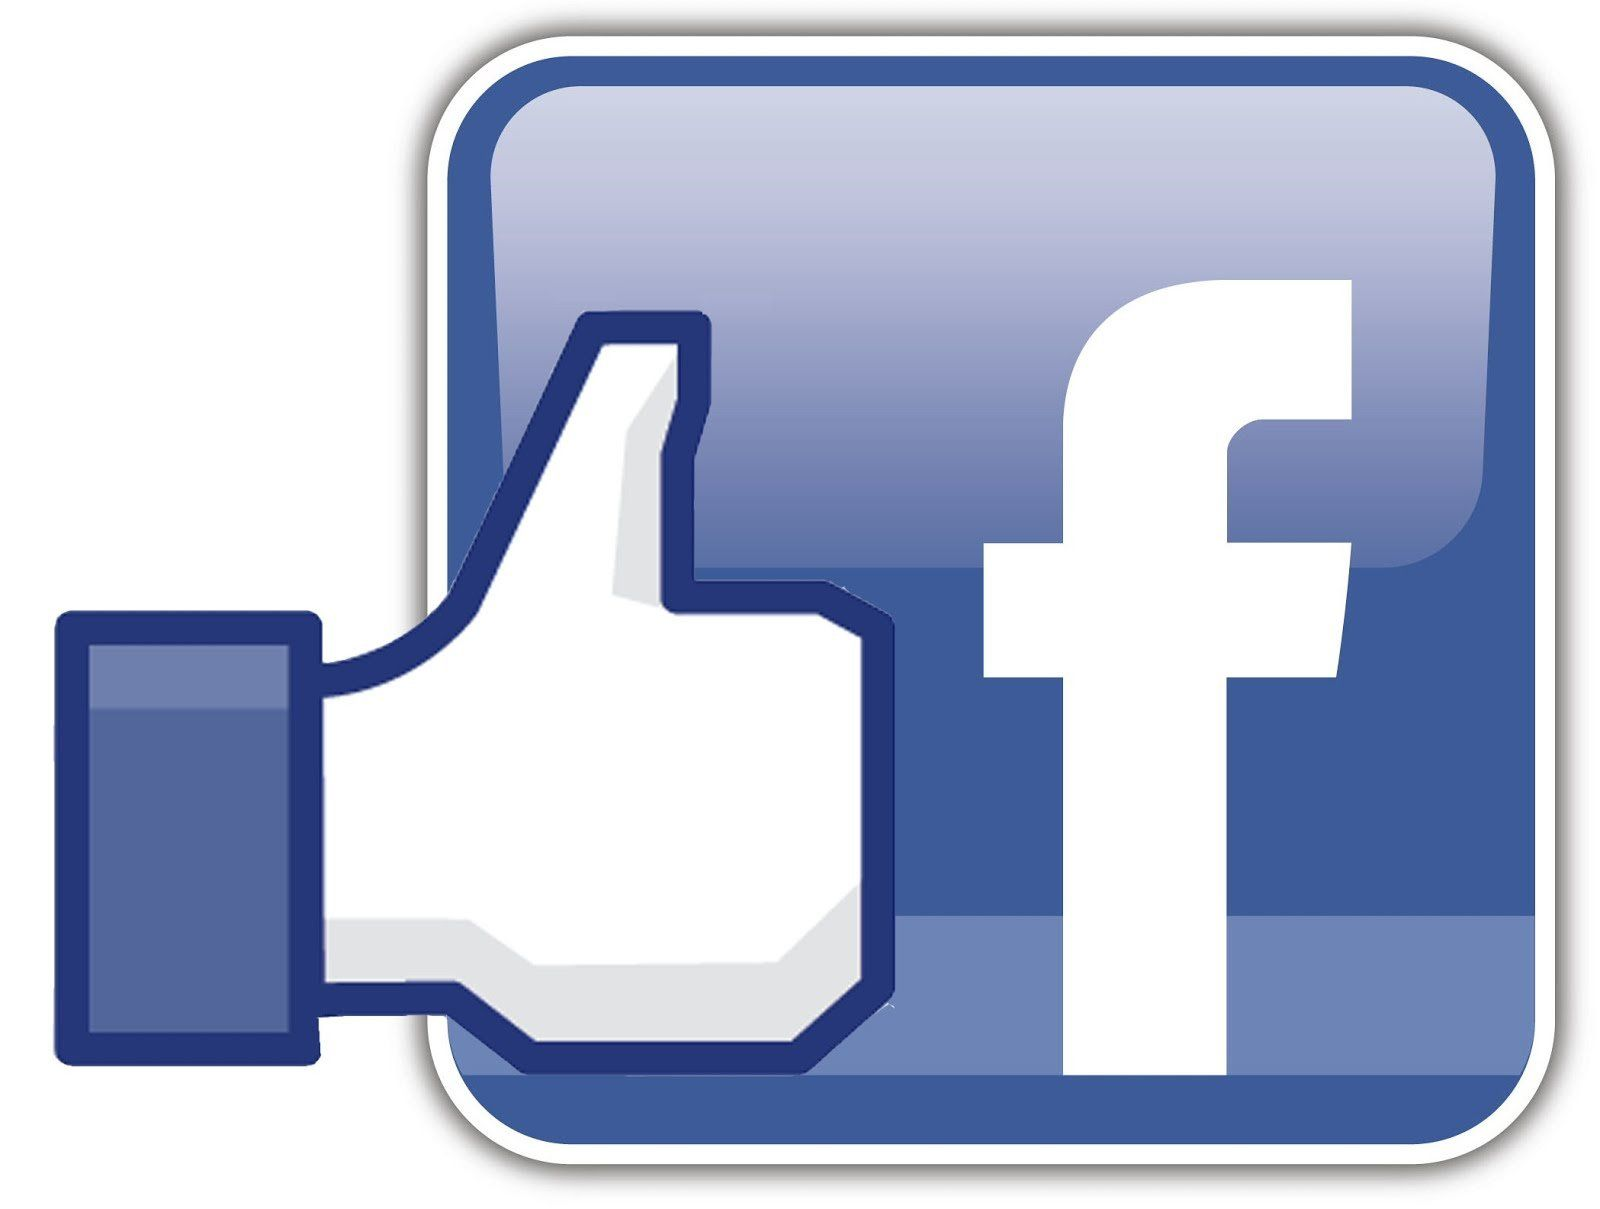 logo facebook rejoignez nous